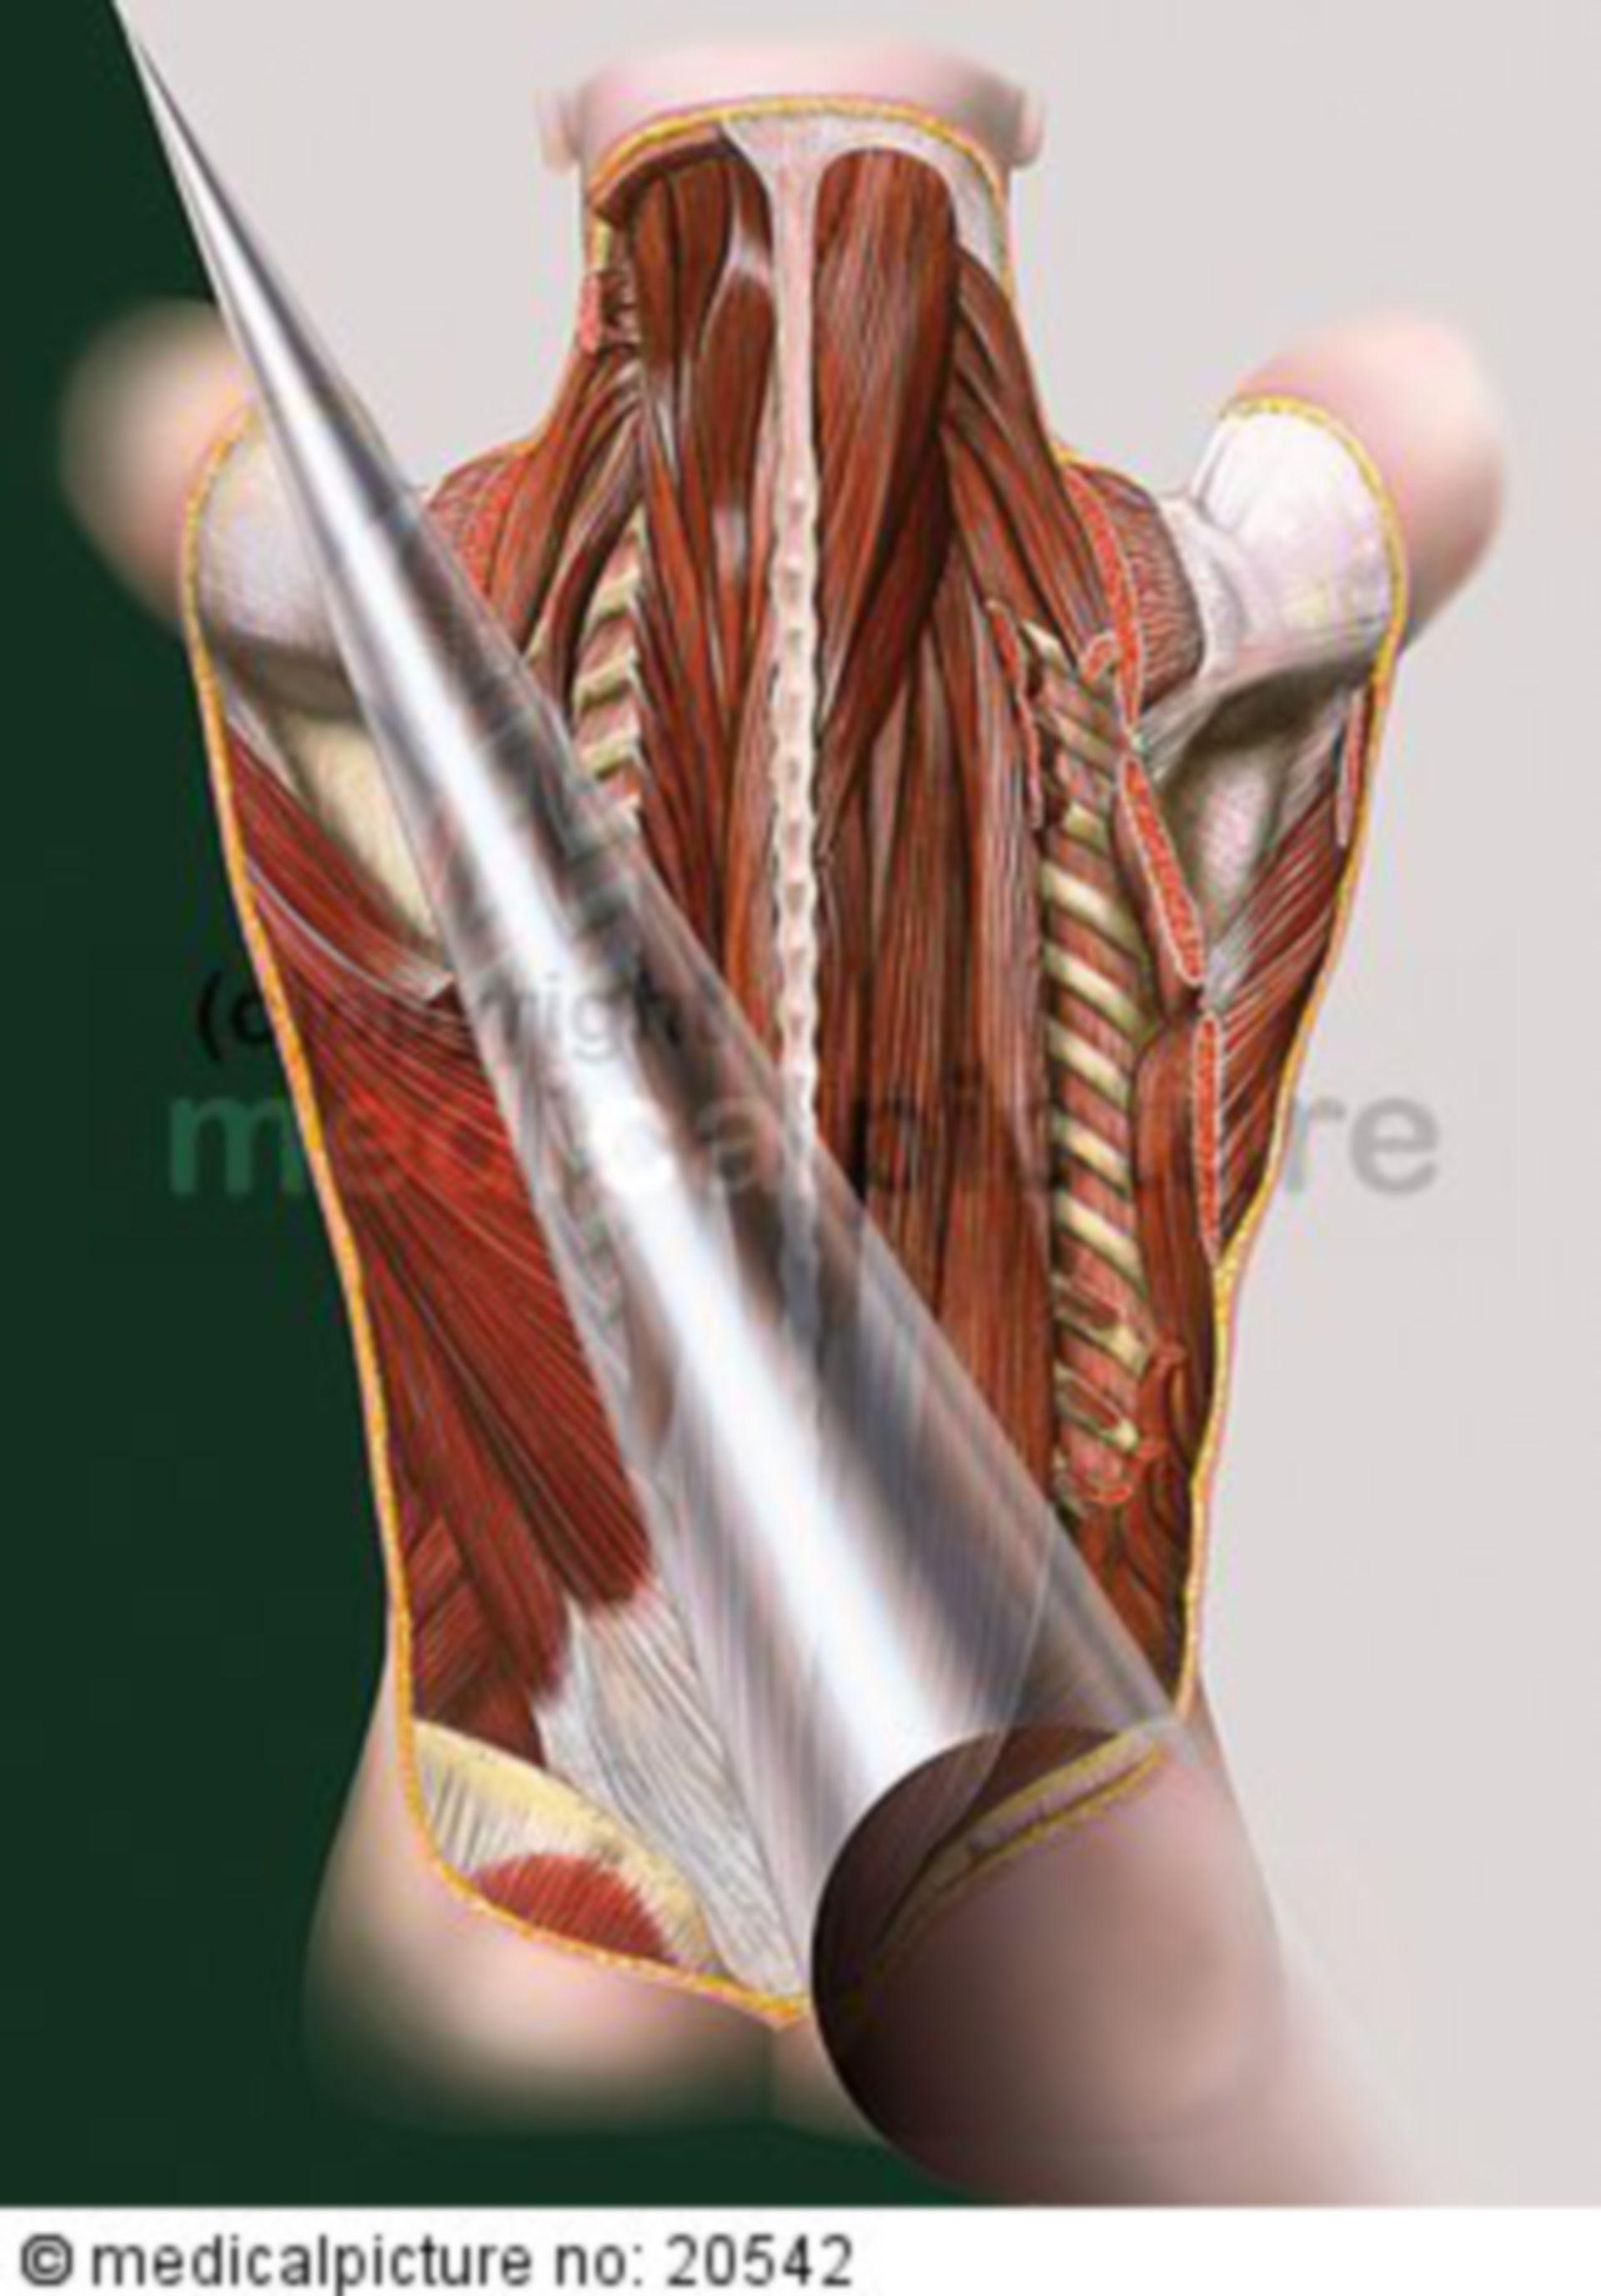 Rückenmuskeln (Mm. dorsi)